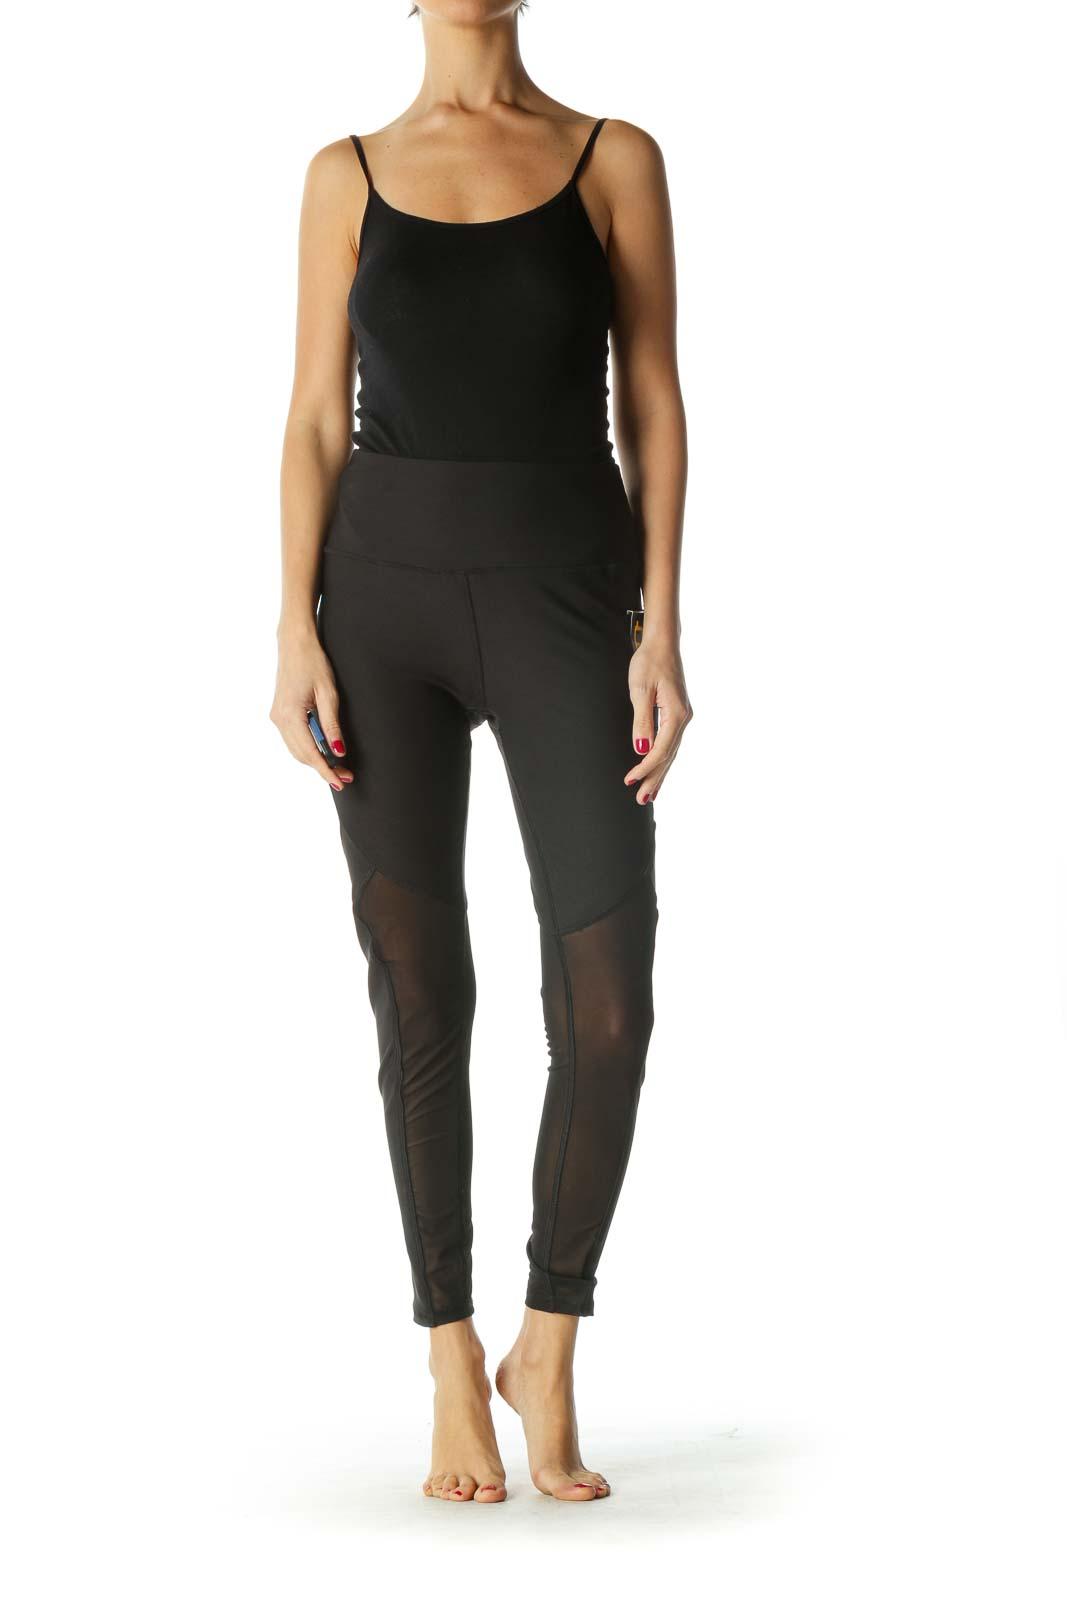 Black Sheer Detail Active Leggings